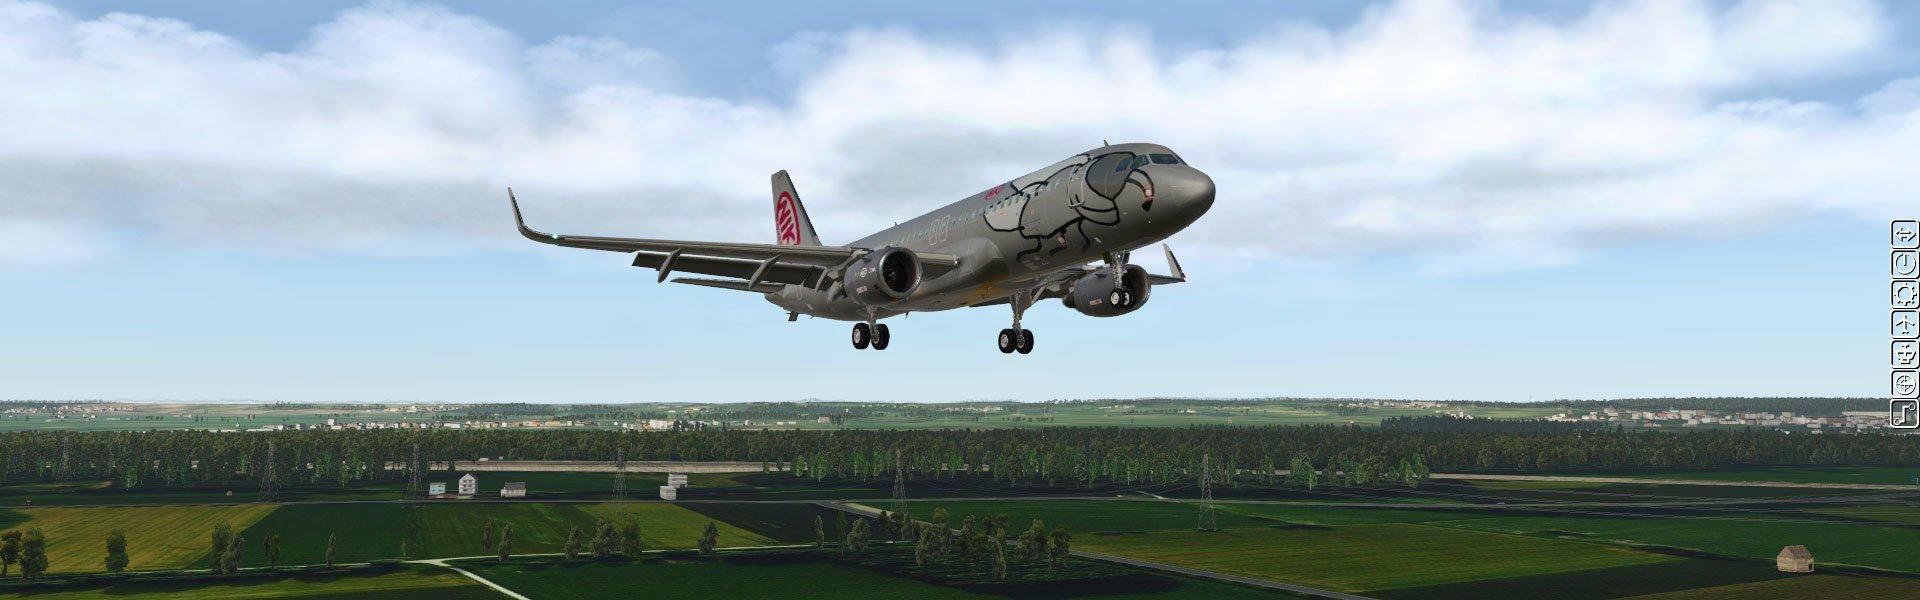 X-Plane 11 - JarDesign A320 - Test   PixelCritics